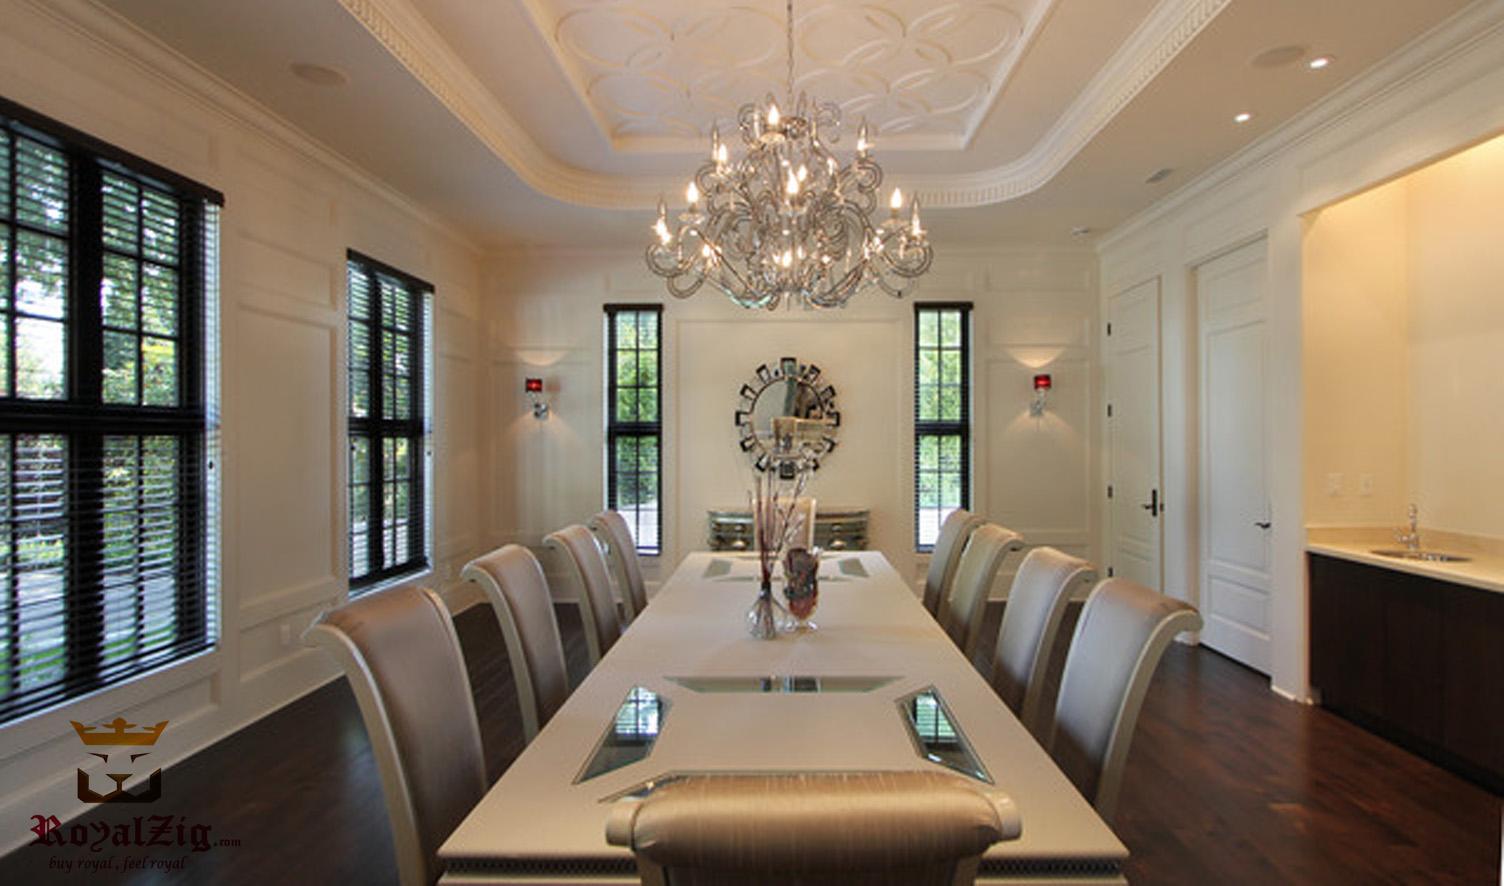 Royalzig Modern Luxury 10 Seater Dining Table